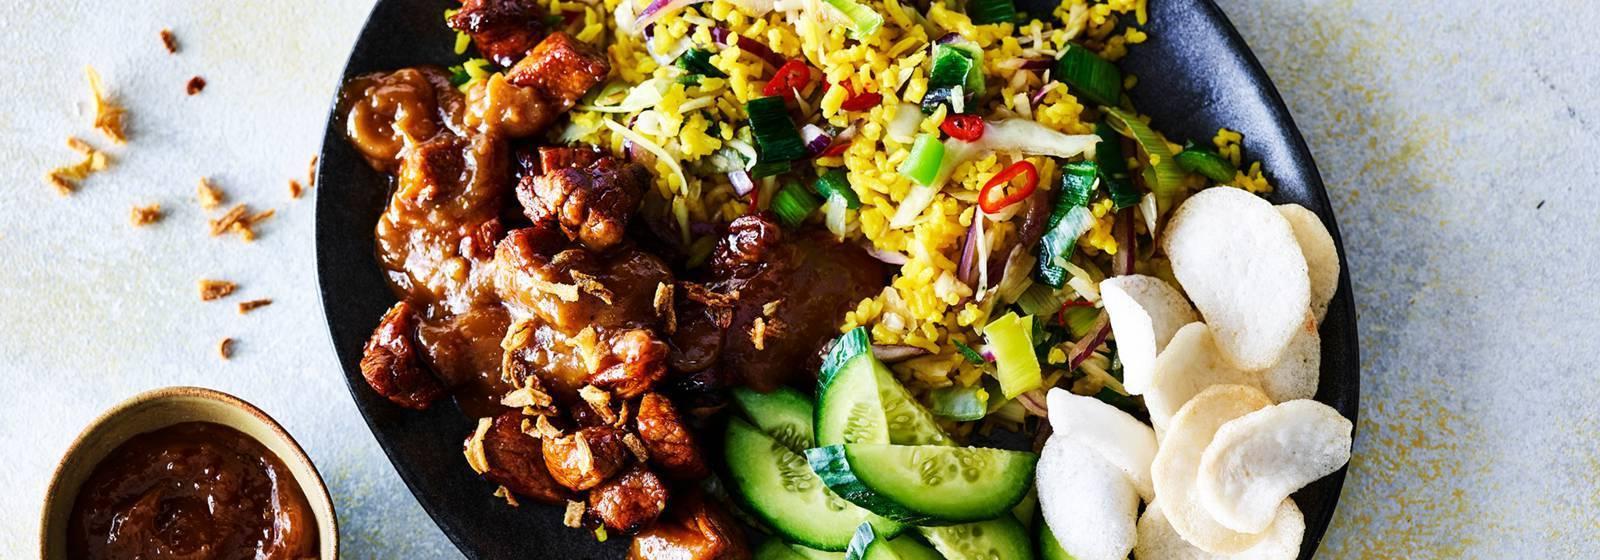 Thai rice stir-fry with vegetables, marinated pork and satay sauce